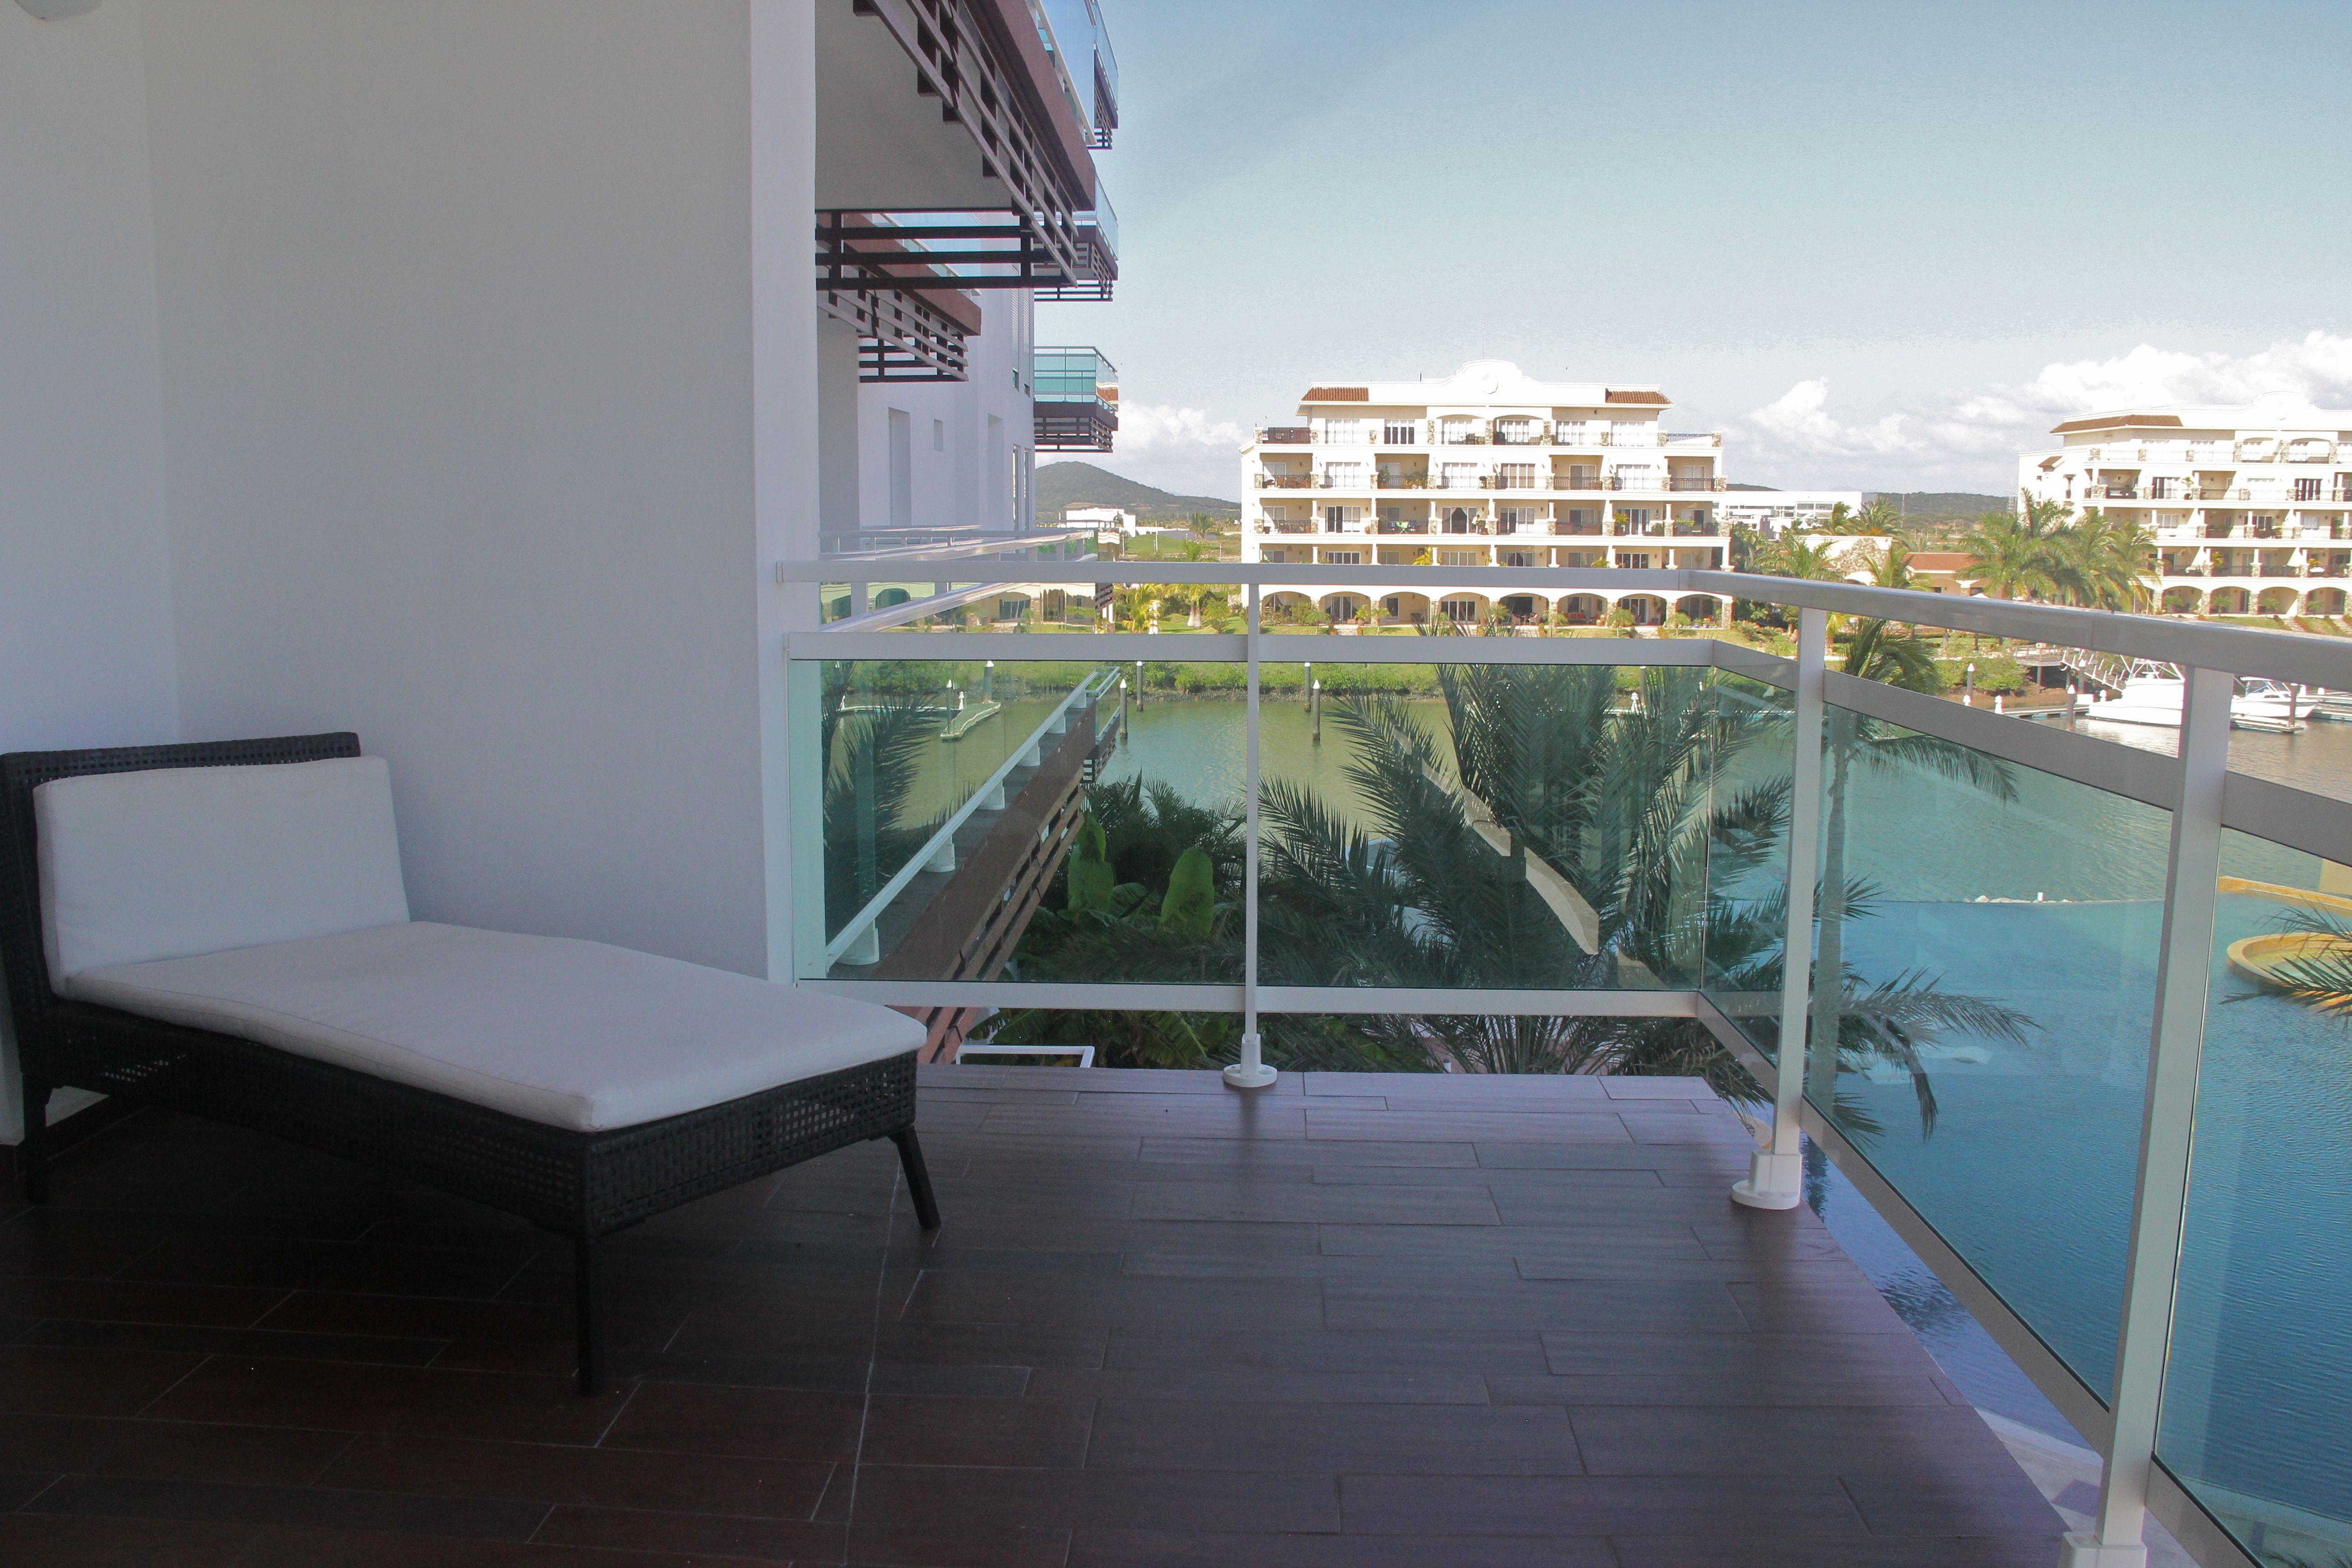 Terrace overlooking pool & marina.